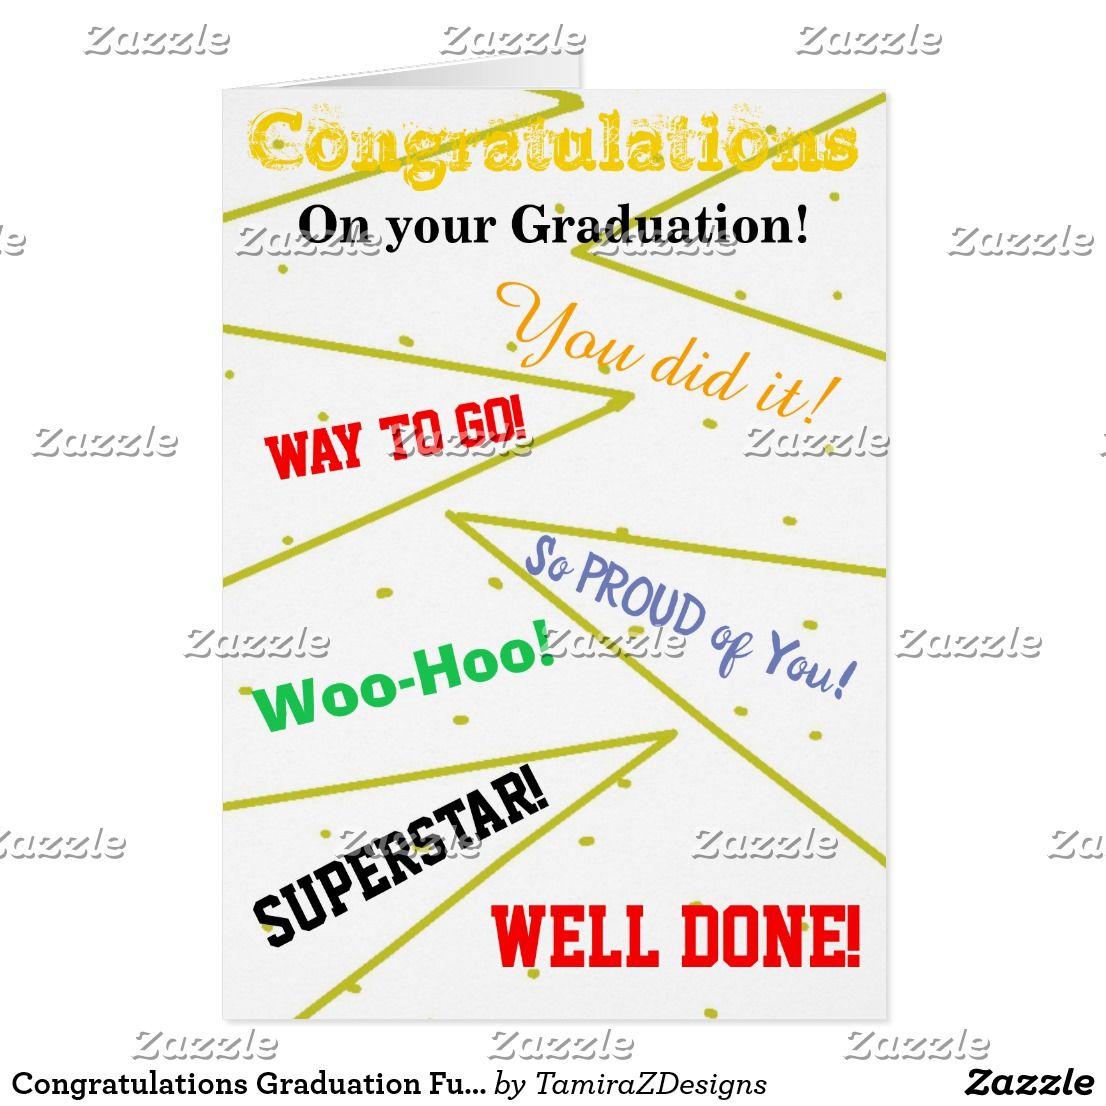 Congratulations Graduation Fun Greeting Card Graduation And Career